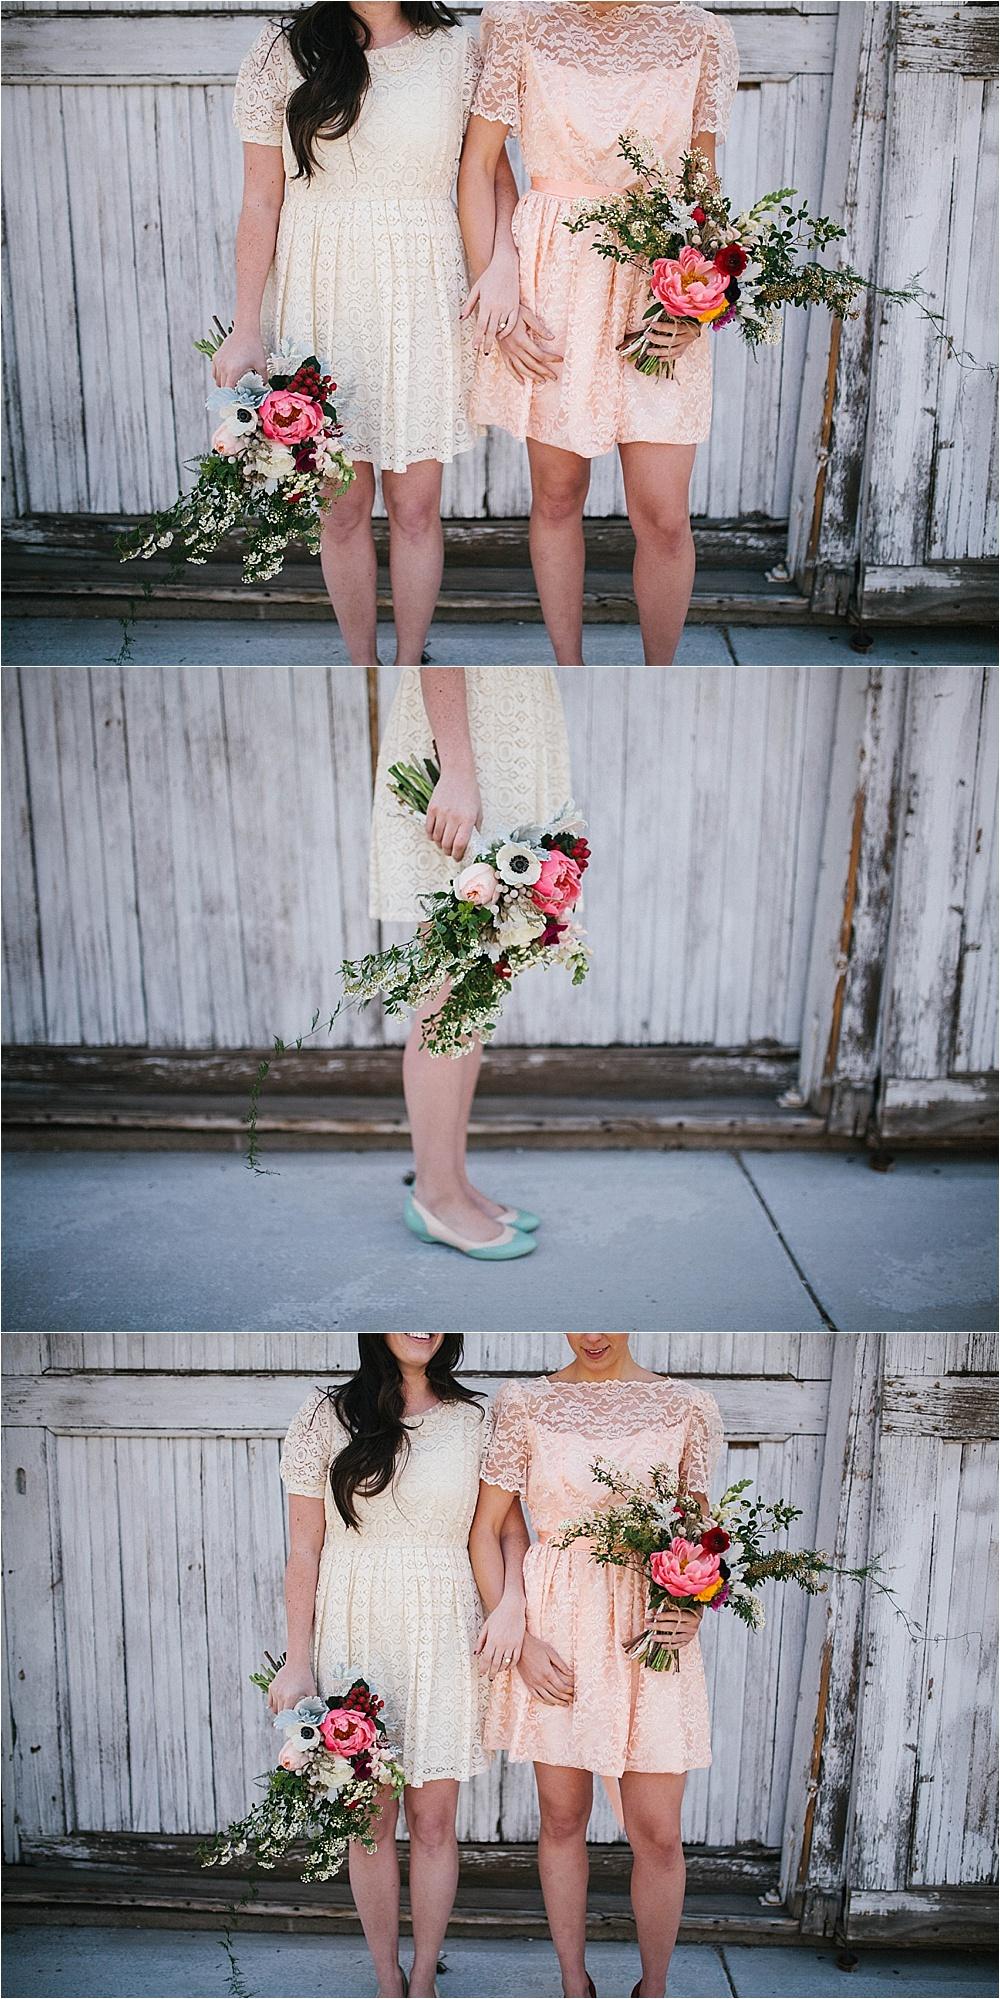 manzanita photo by rebecca caridad wedding lifestlye photography floral design calligraphy_1252.jpg